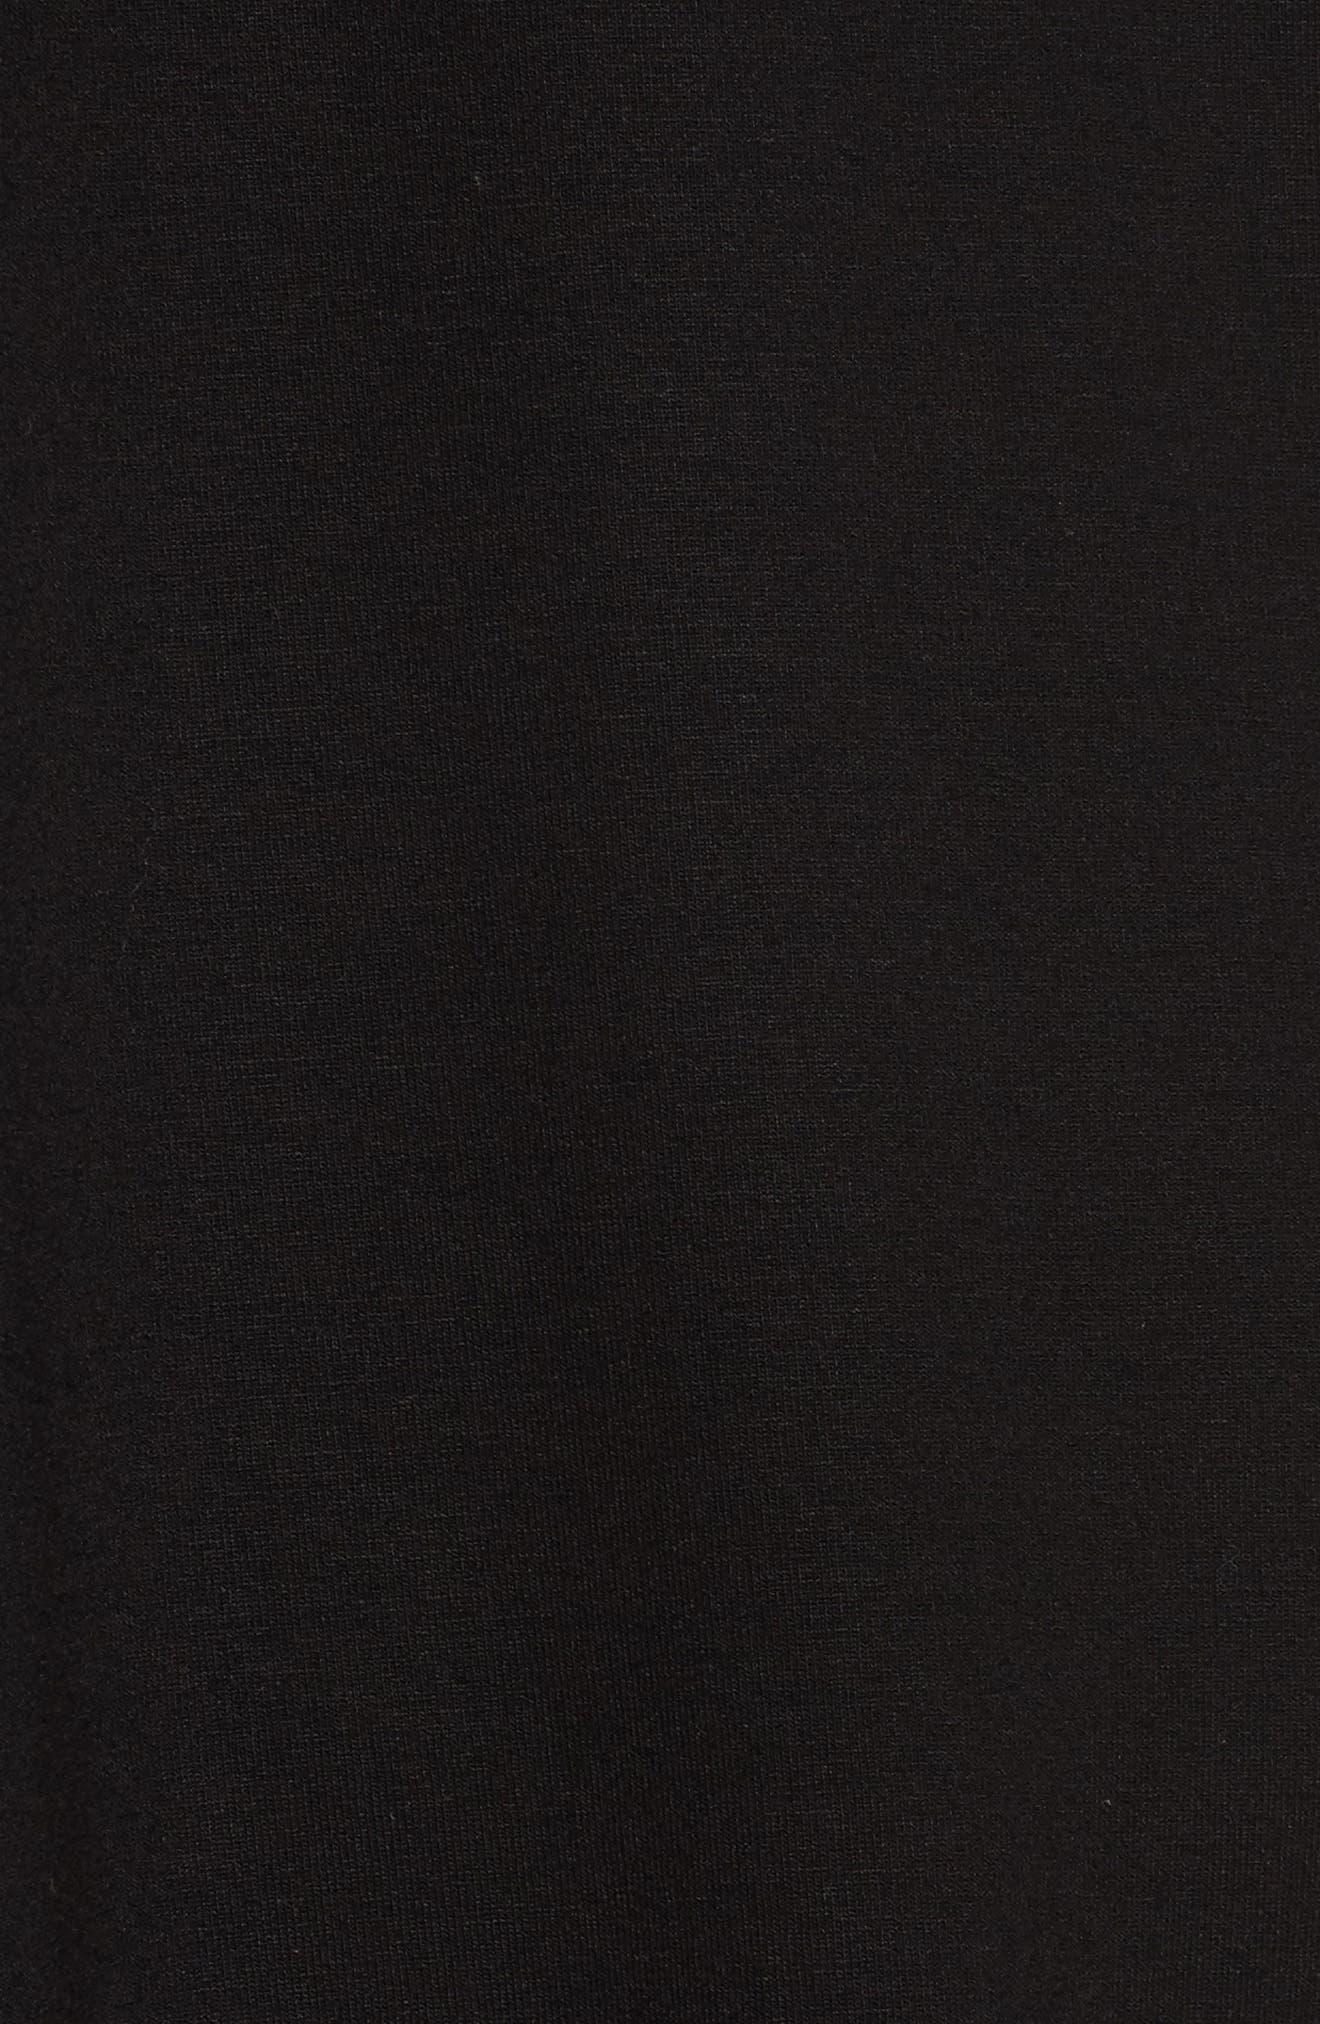 Jersey Top,                             Alternate thumbnail 5, color,                             Black